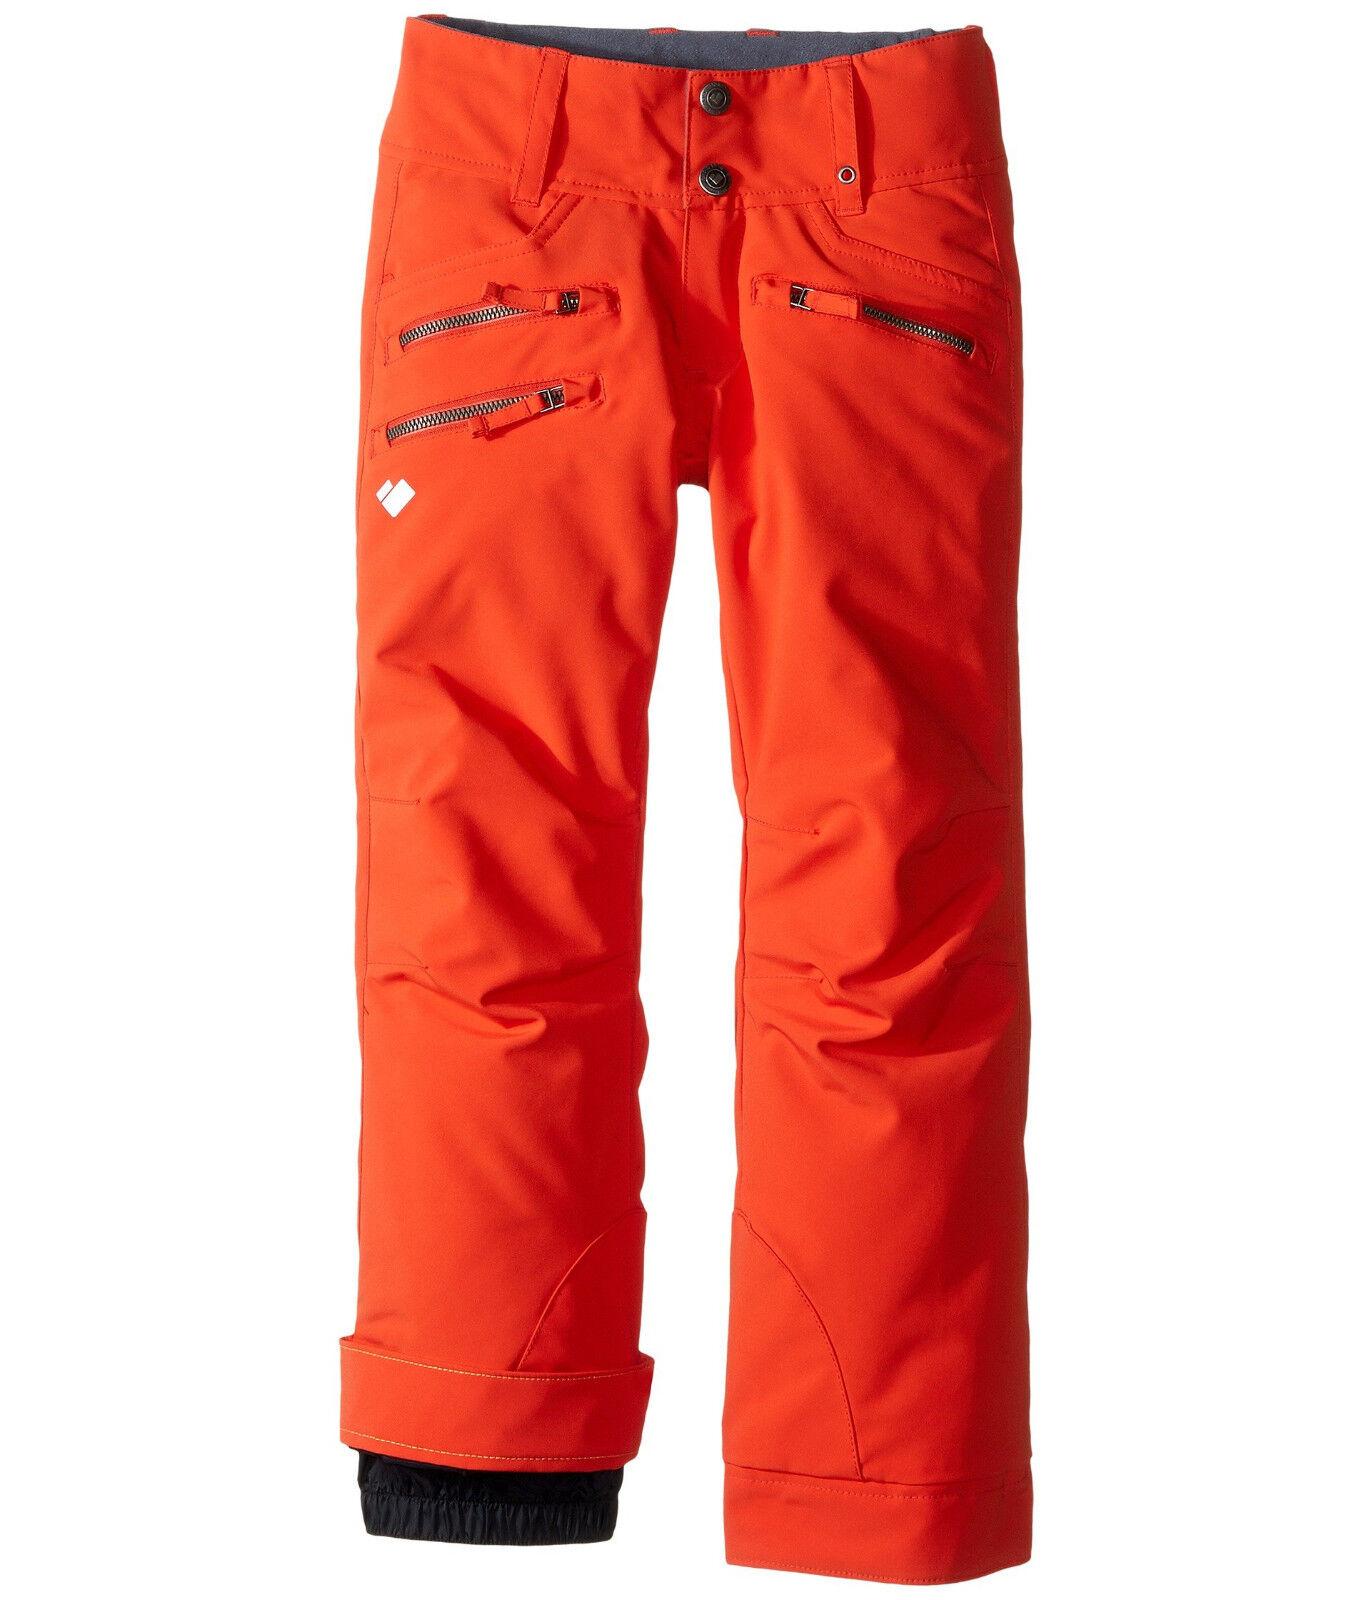 Obermeyer Girls Jessi Insulated Ski Snowboarding Pants, Snow Pant, Größe XL (18)